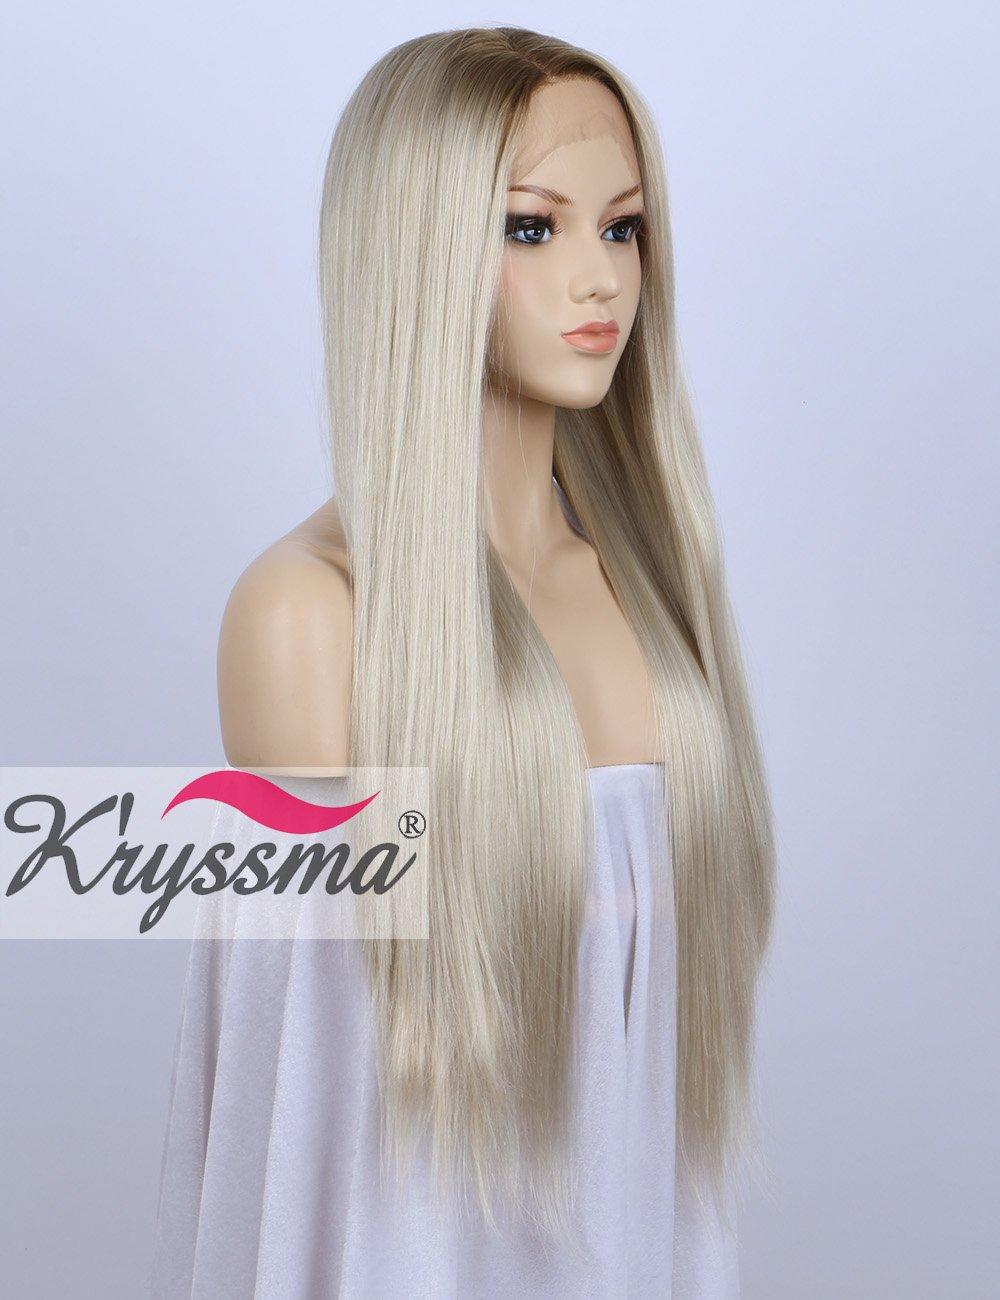 K Ryssma Fashion Ombre Blonde Glueless Lace Front Wigs